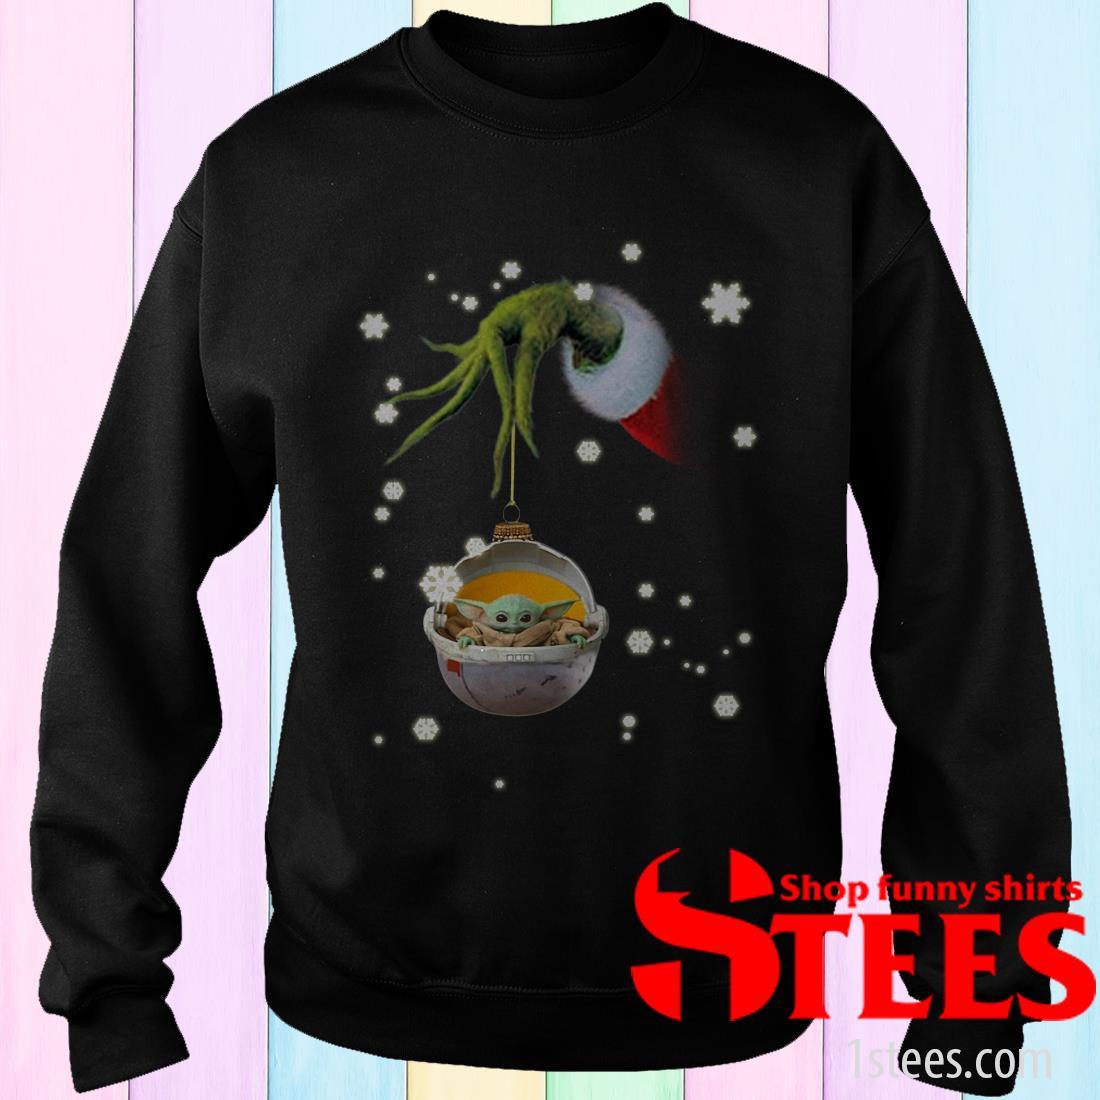 Grinch Hand Holding Baby Yoda Christmas Sweatshirt